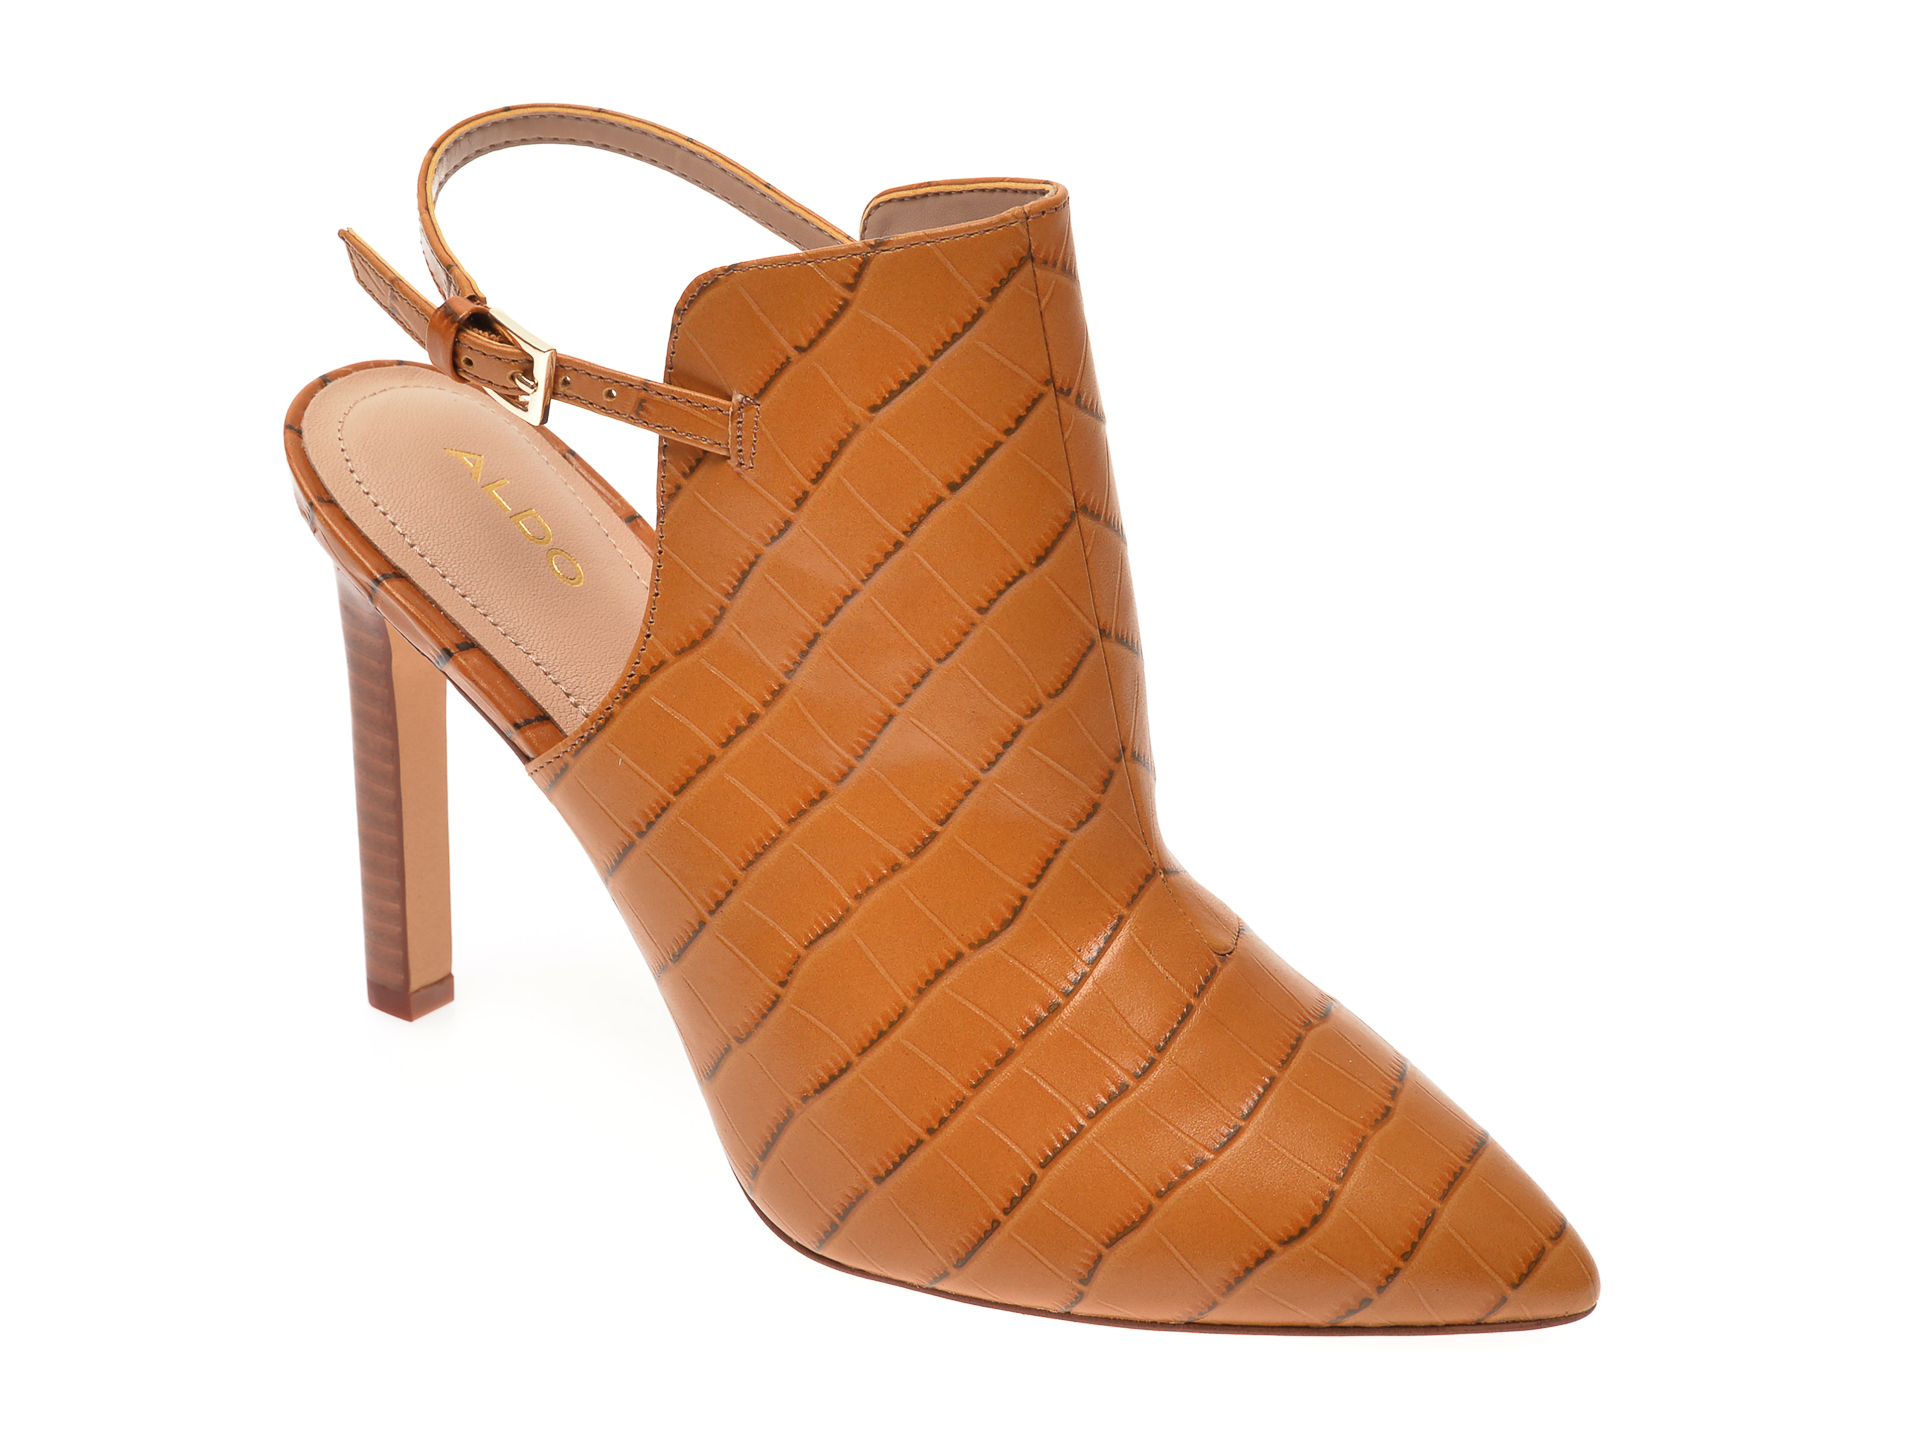 Pantofi ALDO maro, Firleigh220, din piele naturala imagine otter.ro 2021